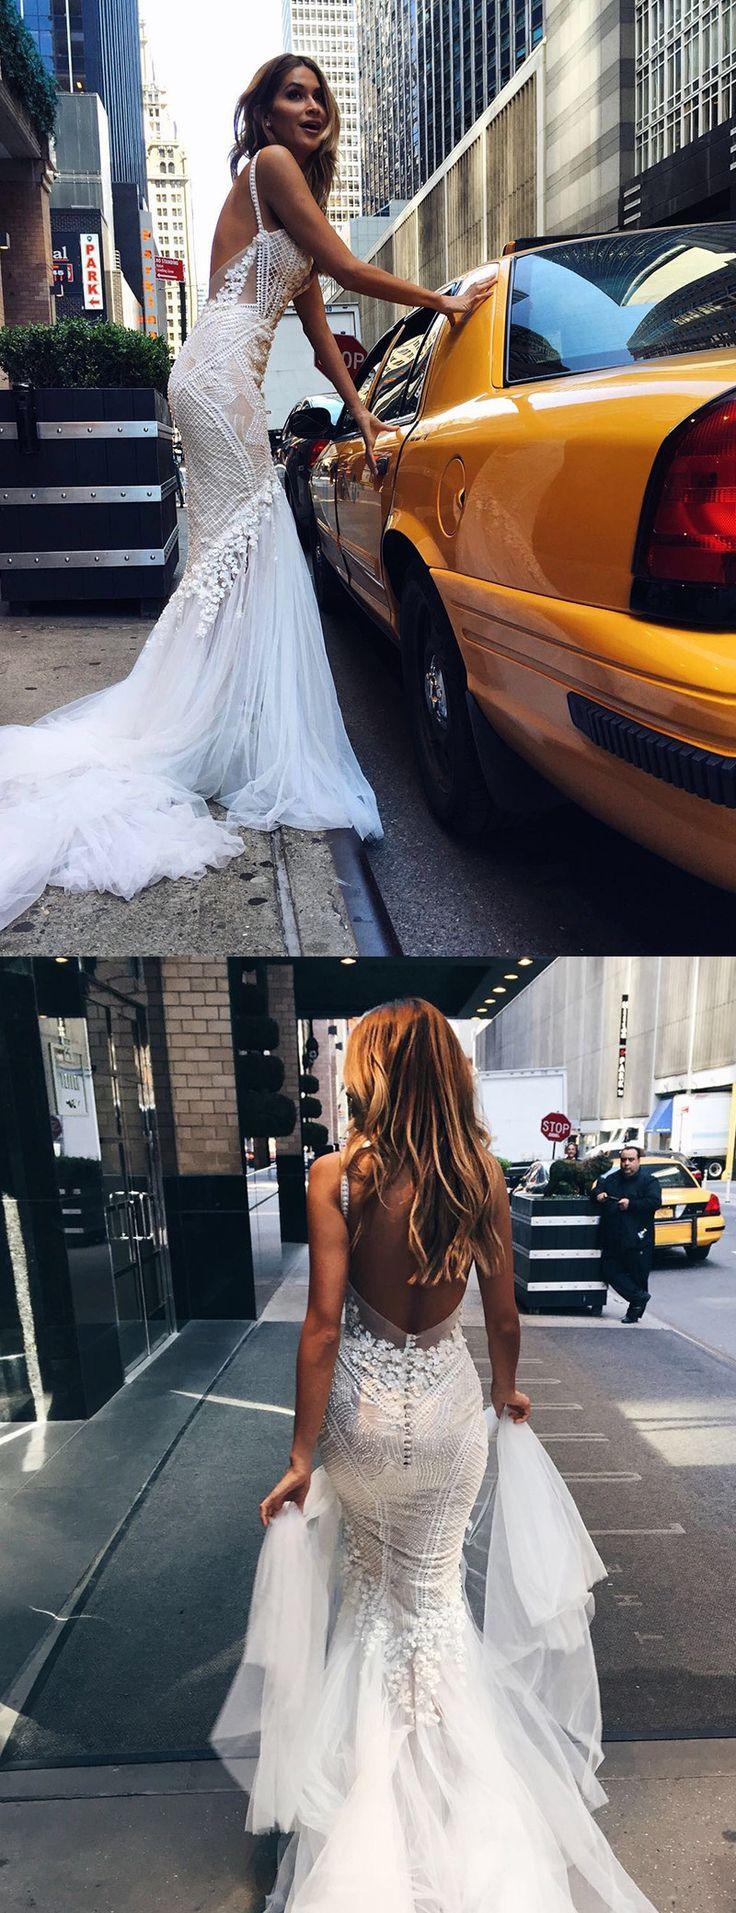 2017 wedding dress, long wedding dress, mermaid wedding dress